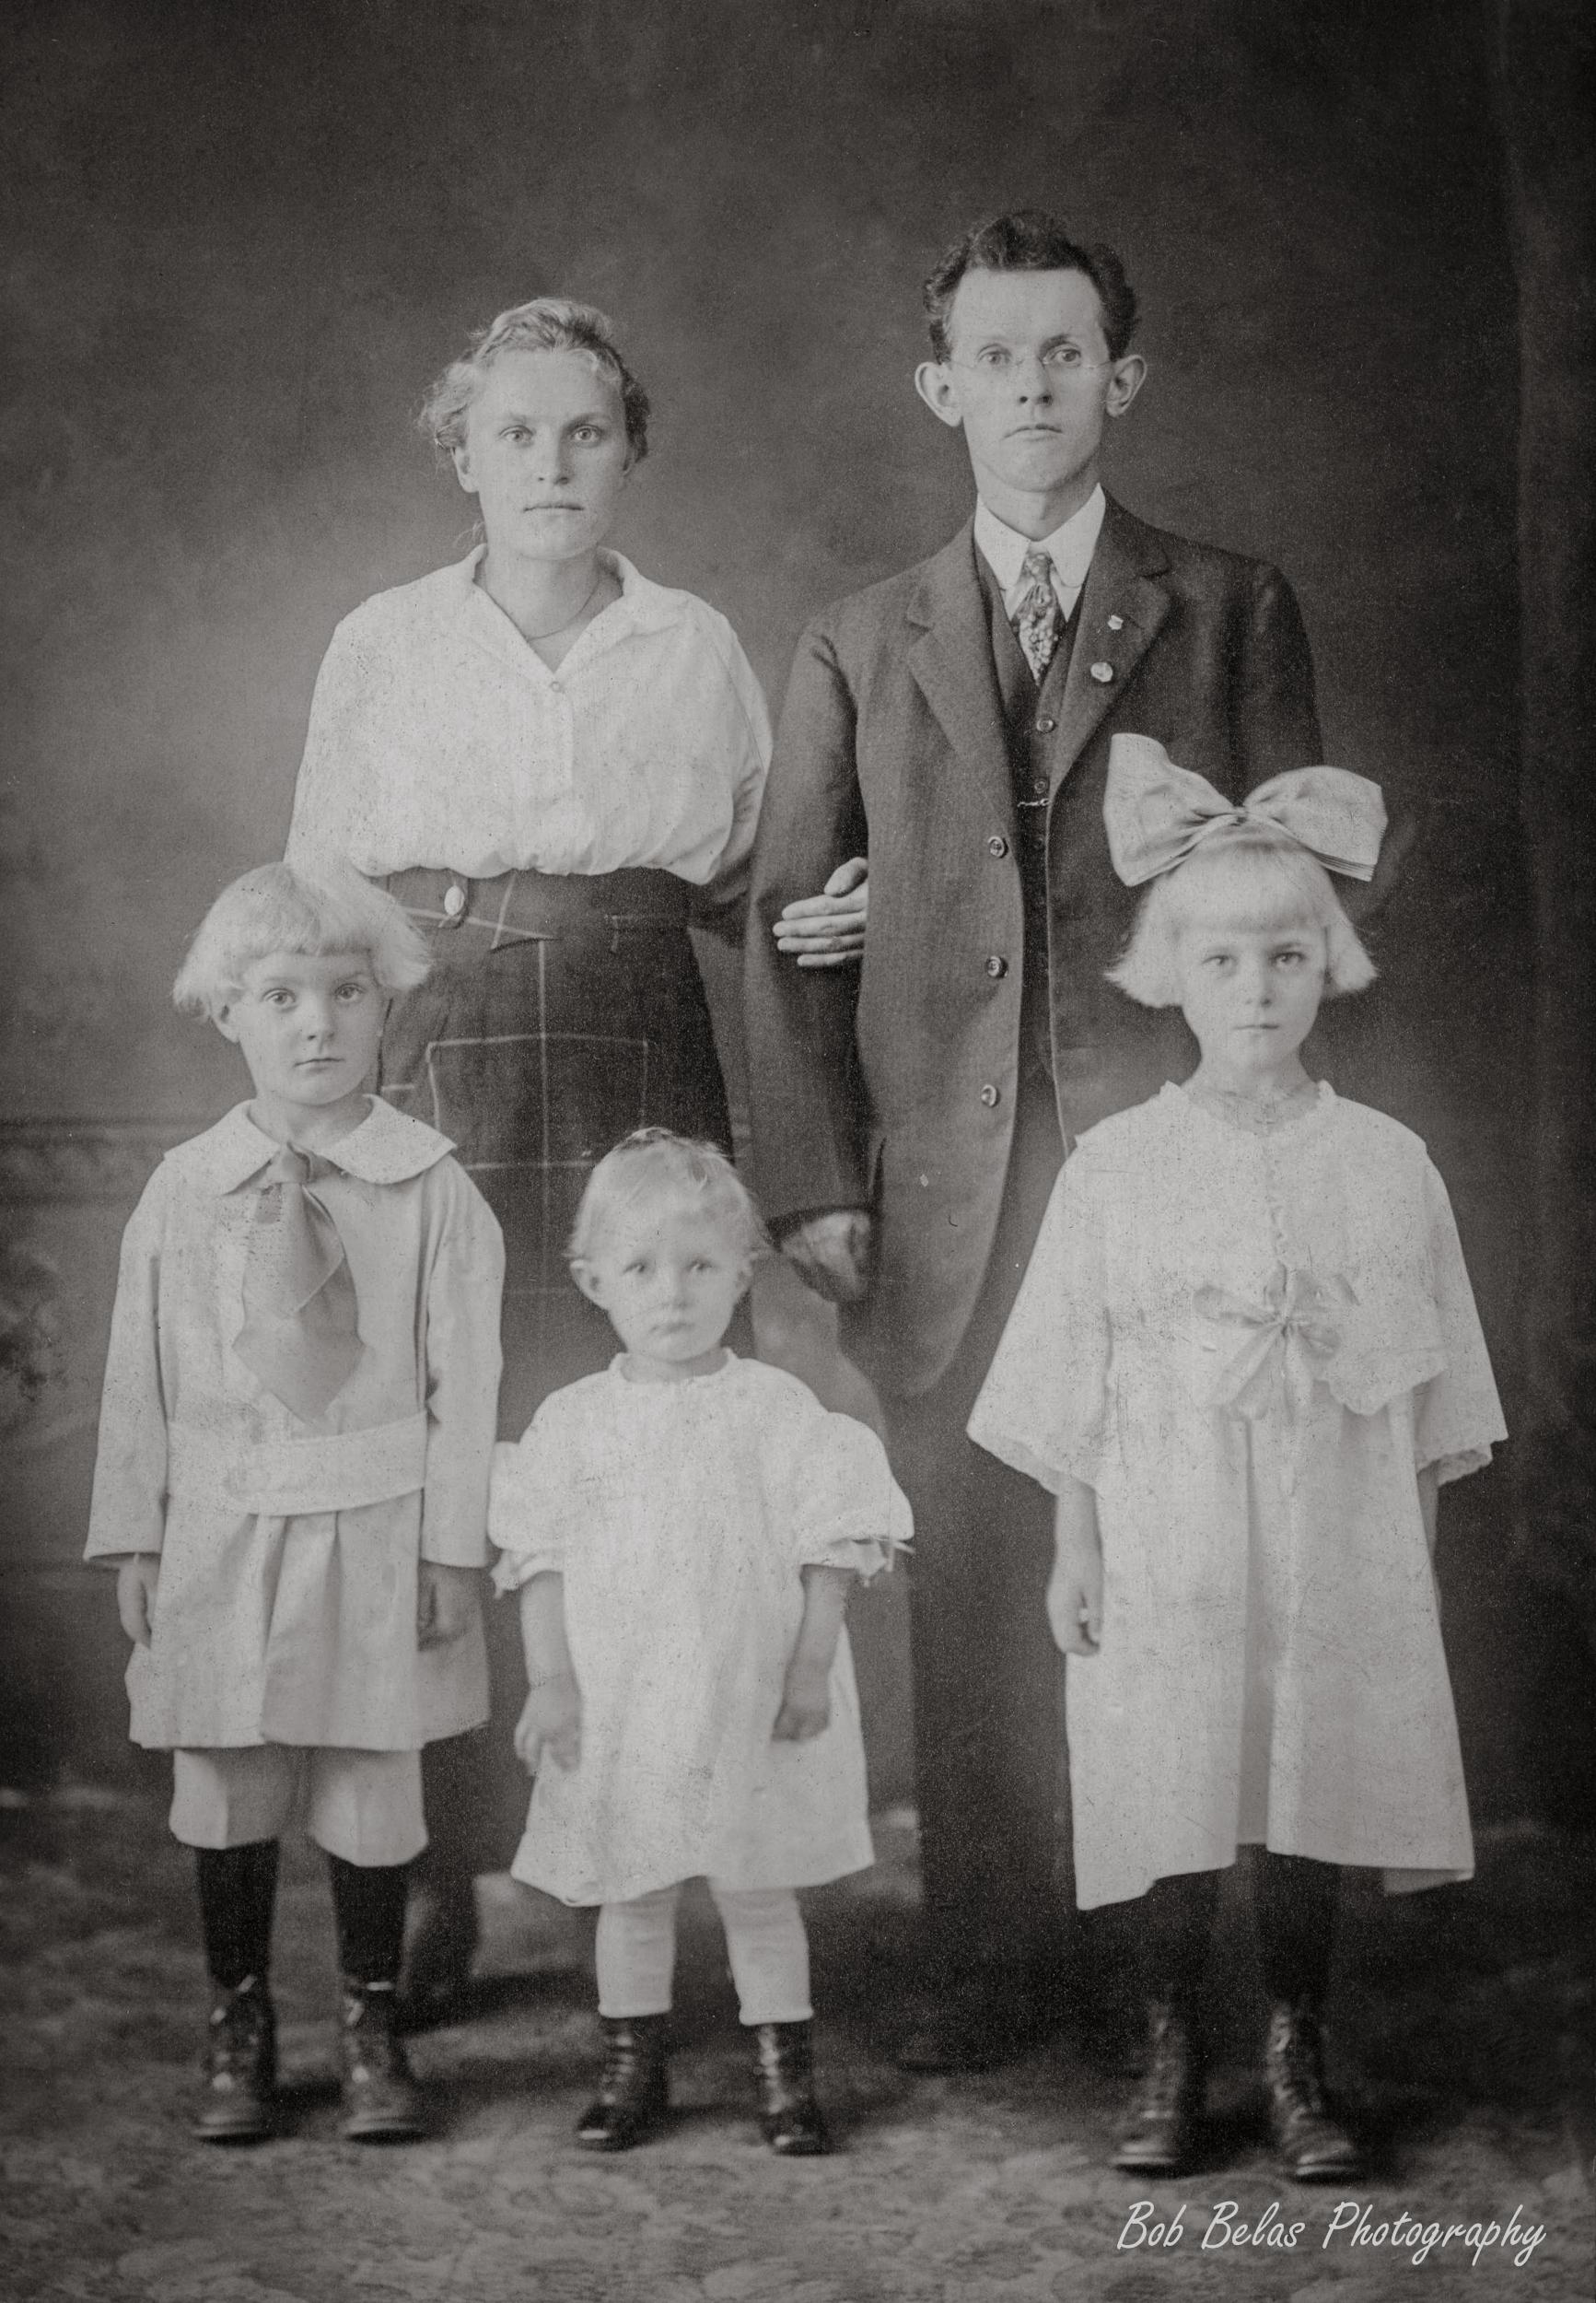 Jacob Guterch family 1918, monochrome